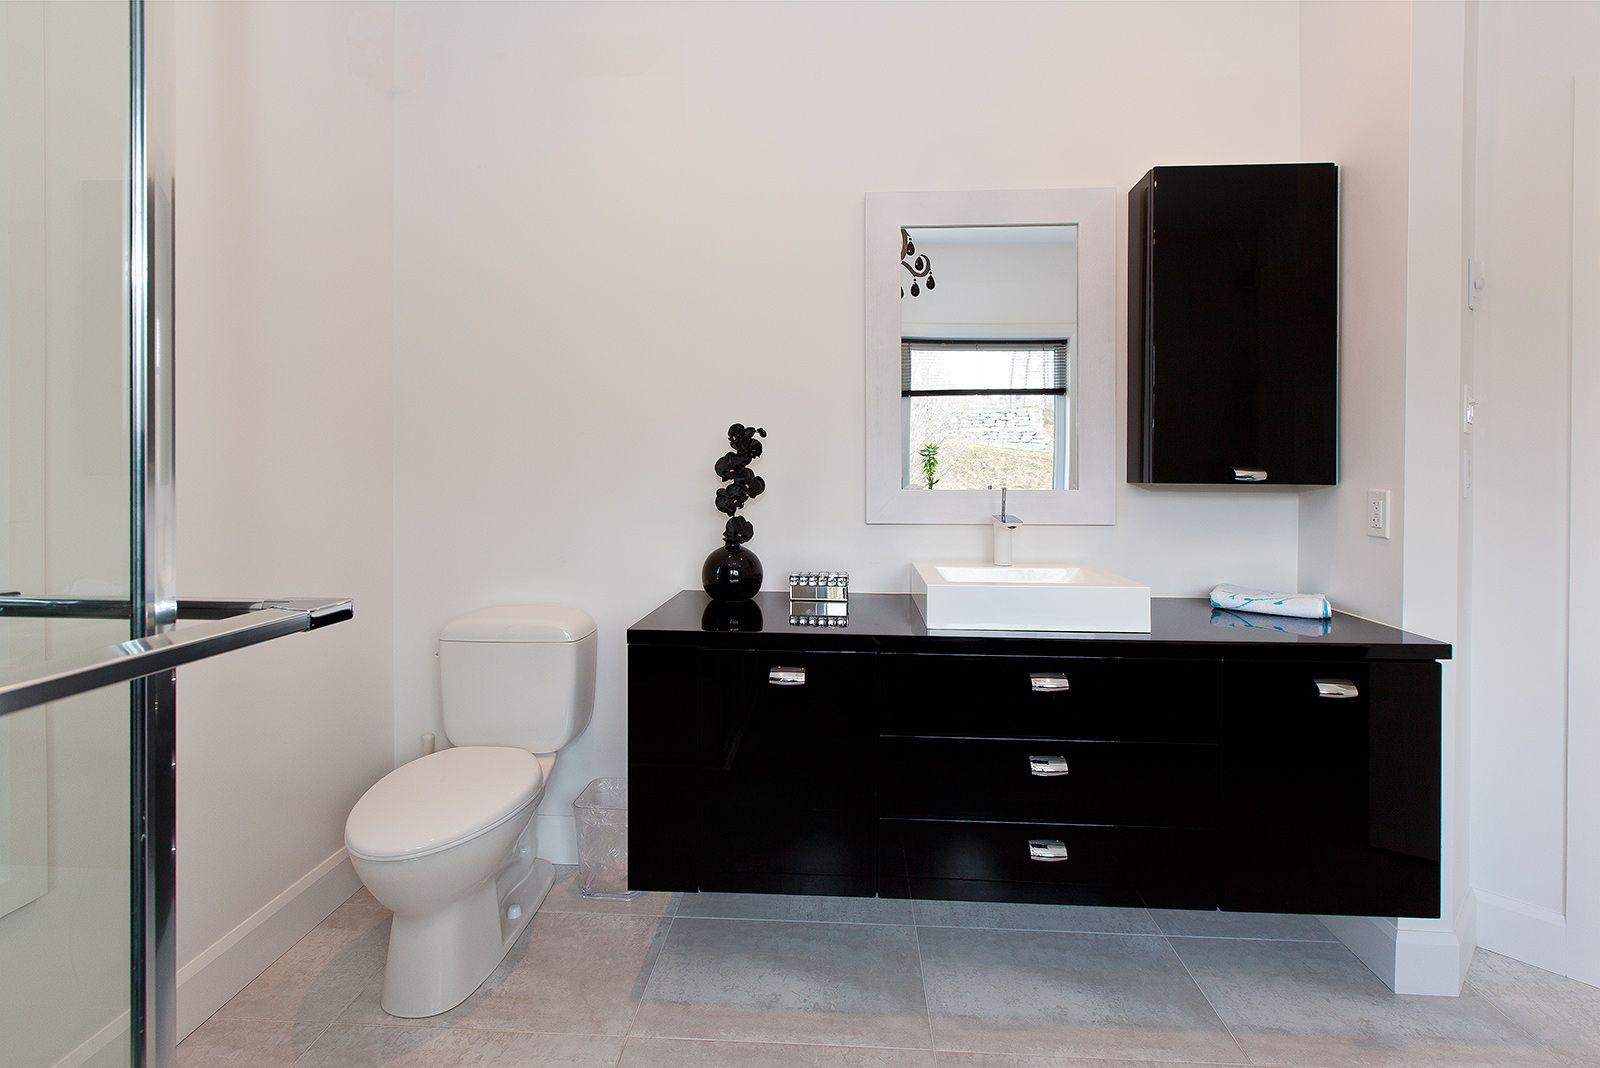 Salle de bains moderne griffe cuisine for Manon leblanc salle de bain